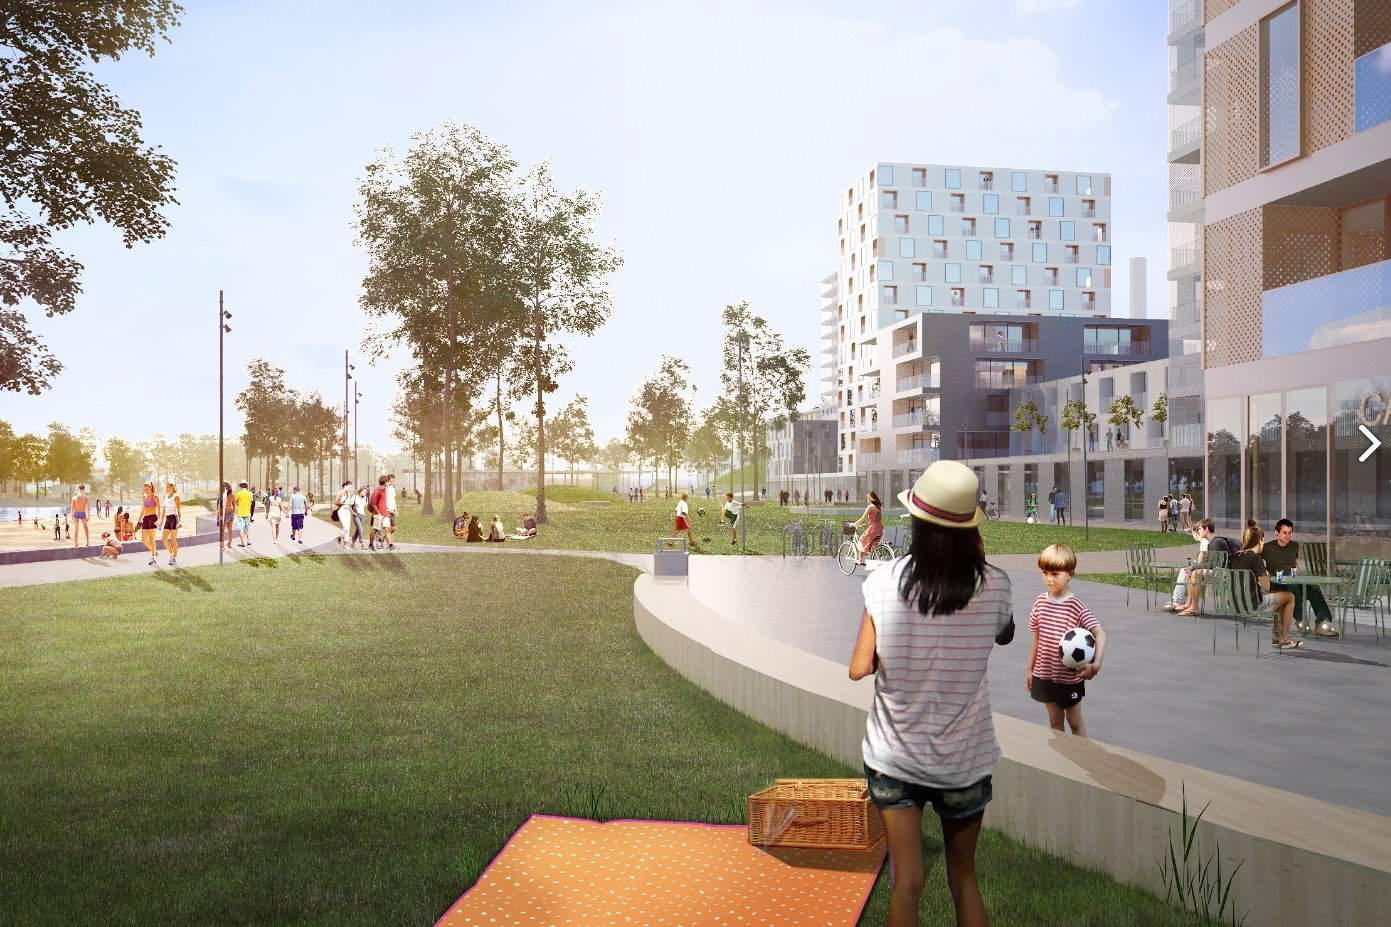 South Buda to be turned into a hypermodern metropolis